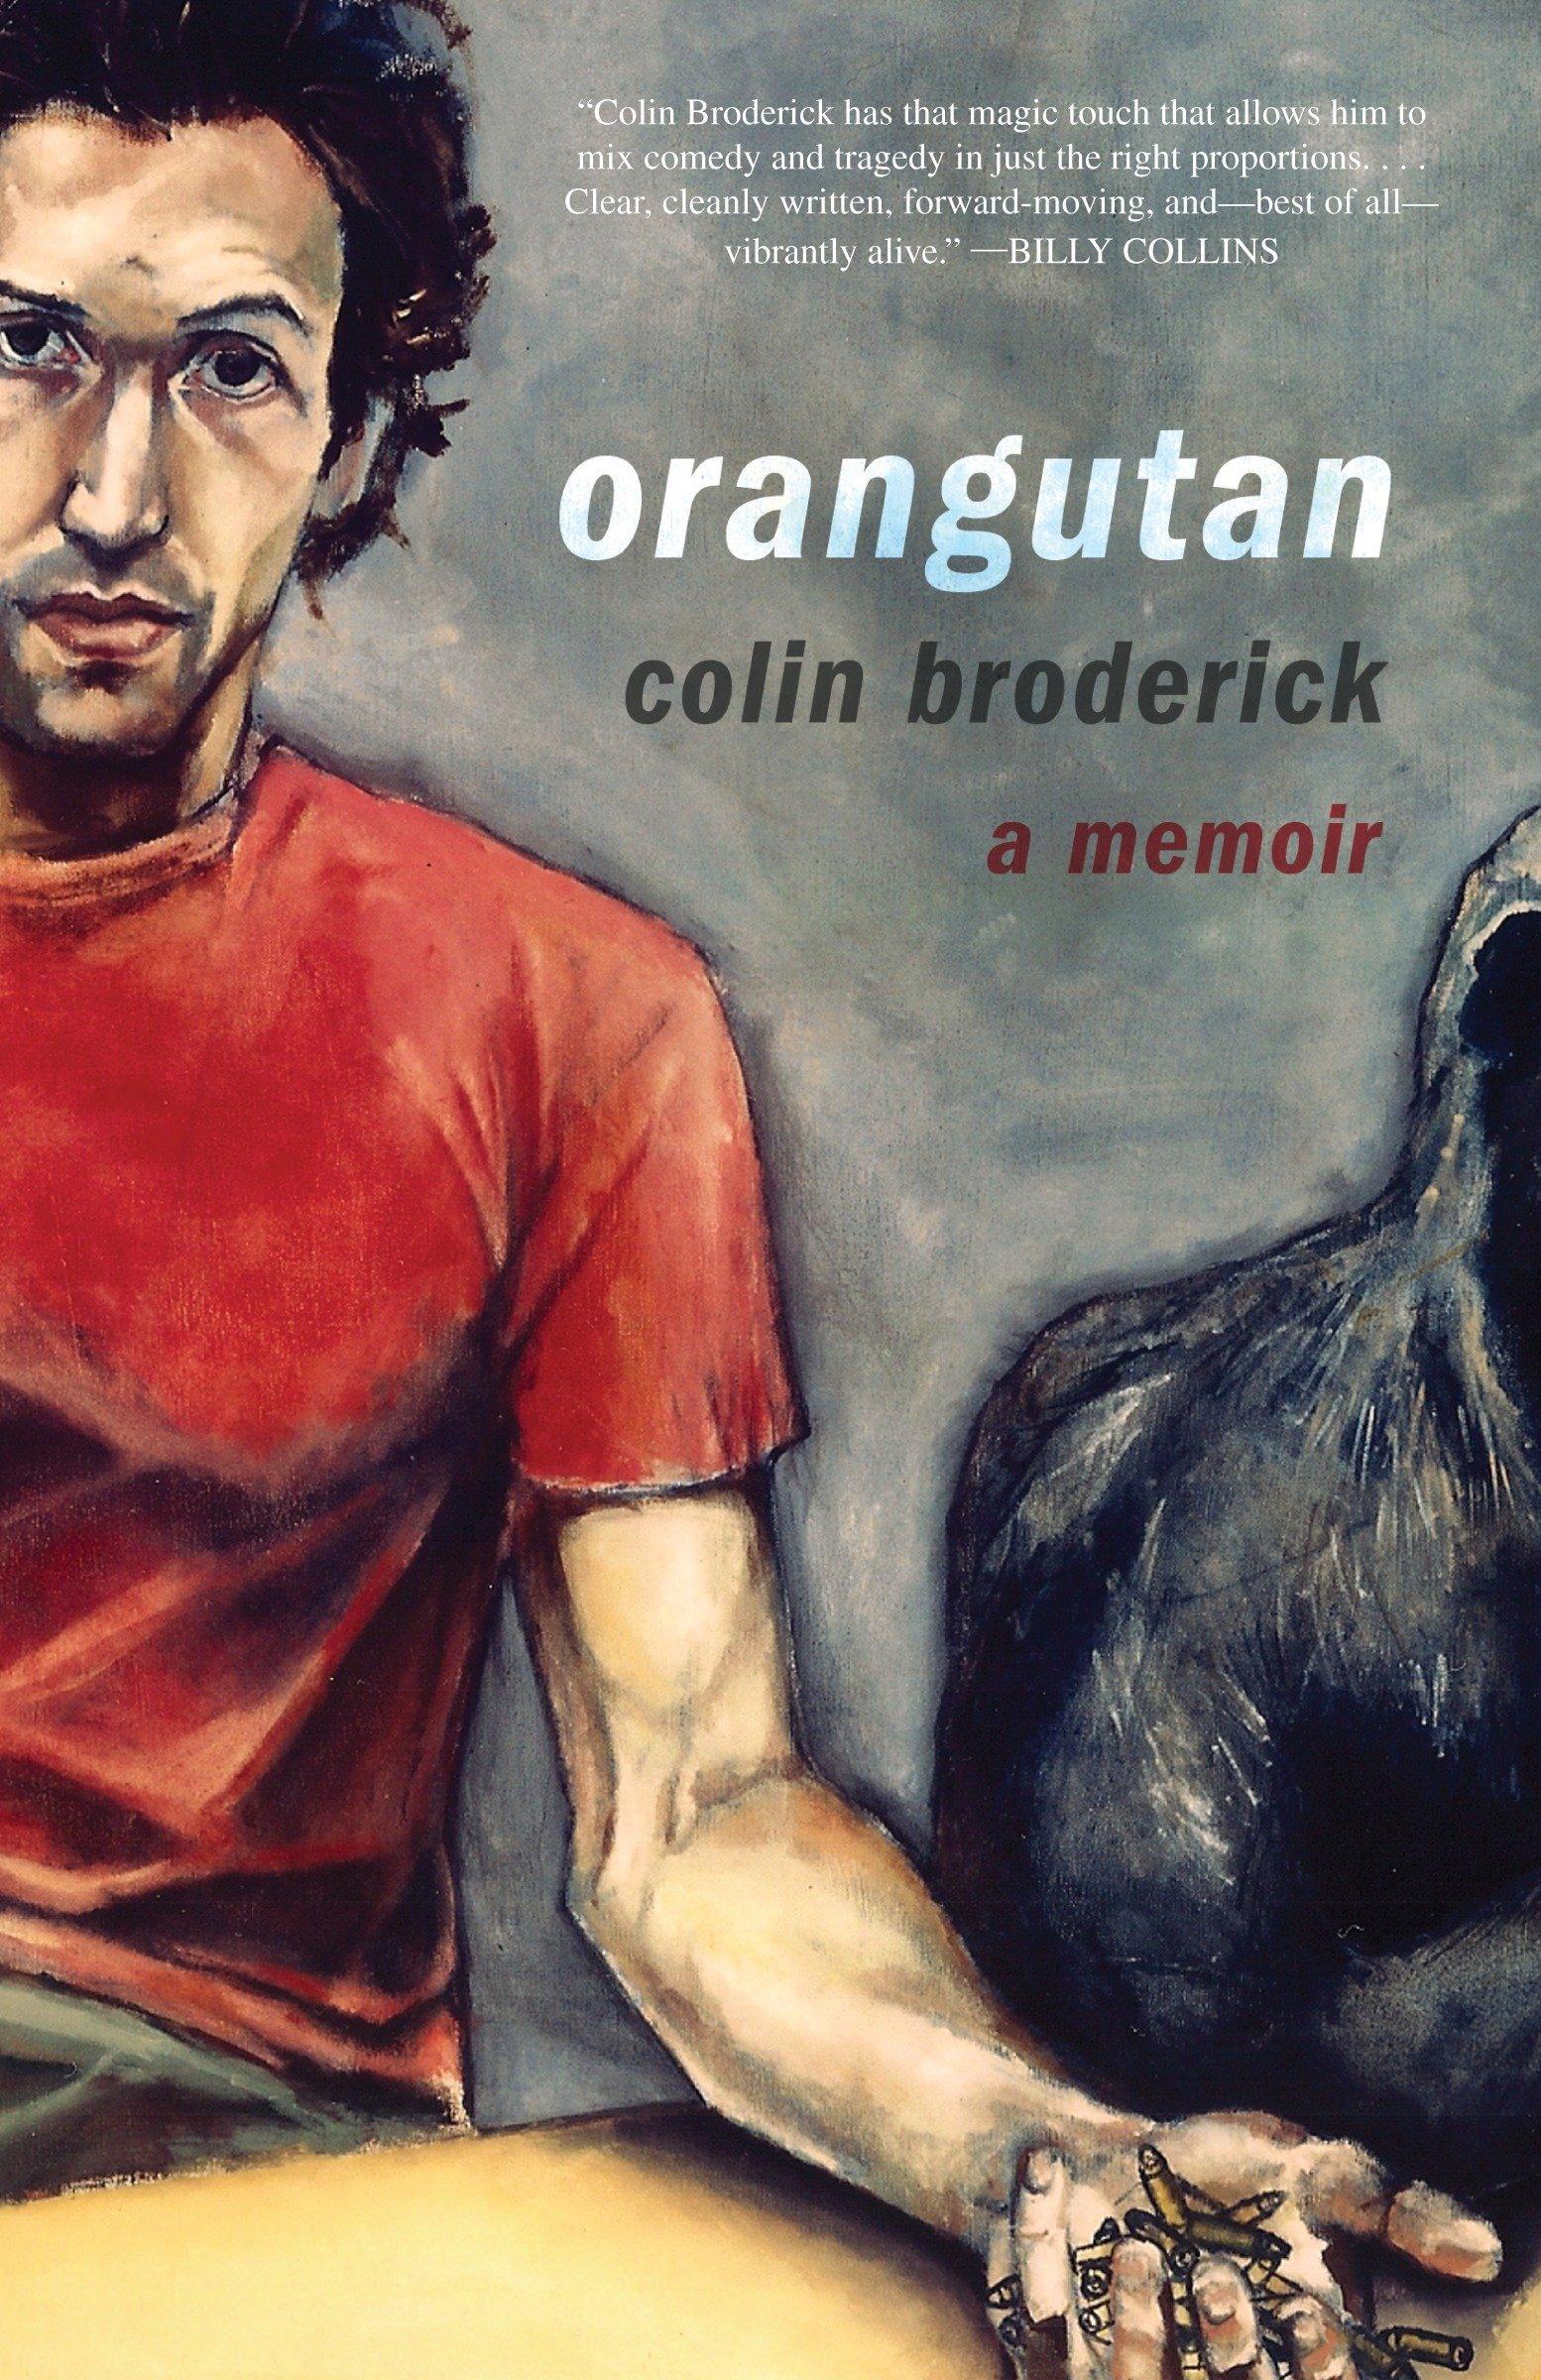 orangutan broderick colin